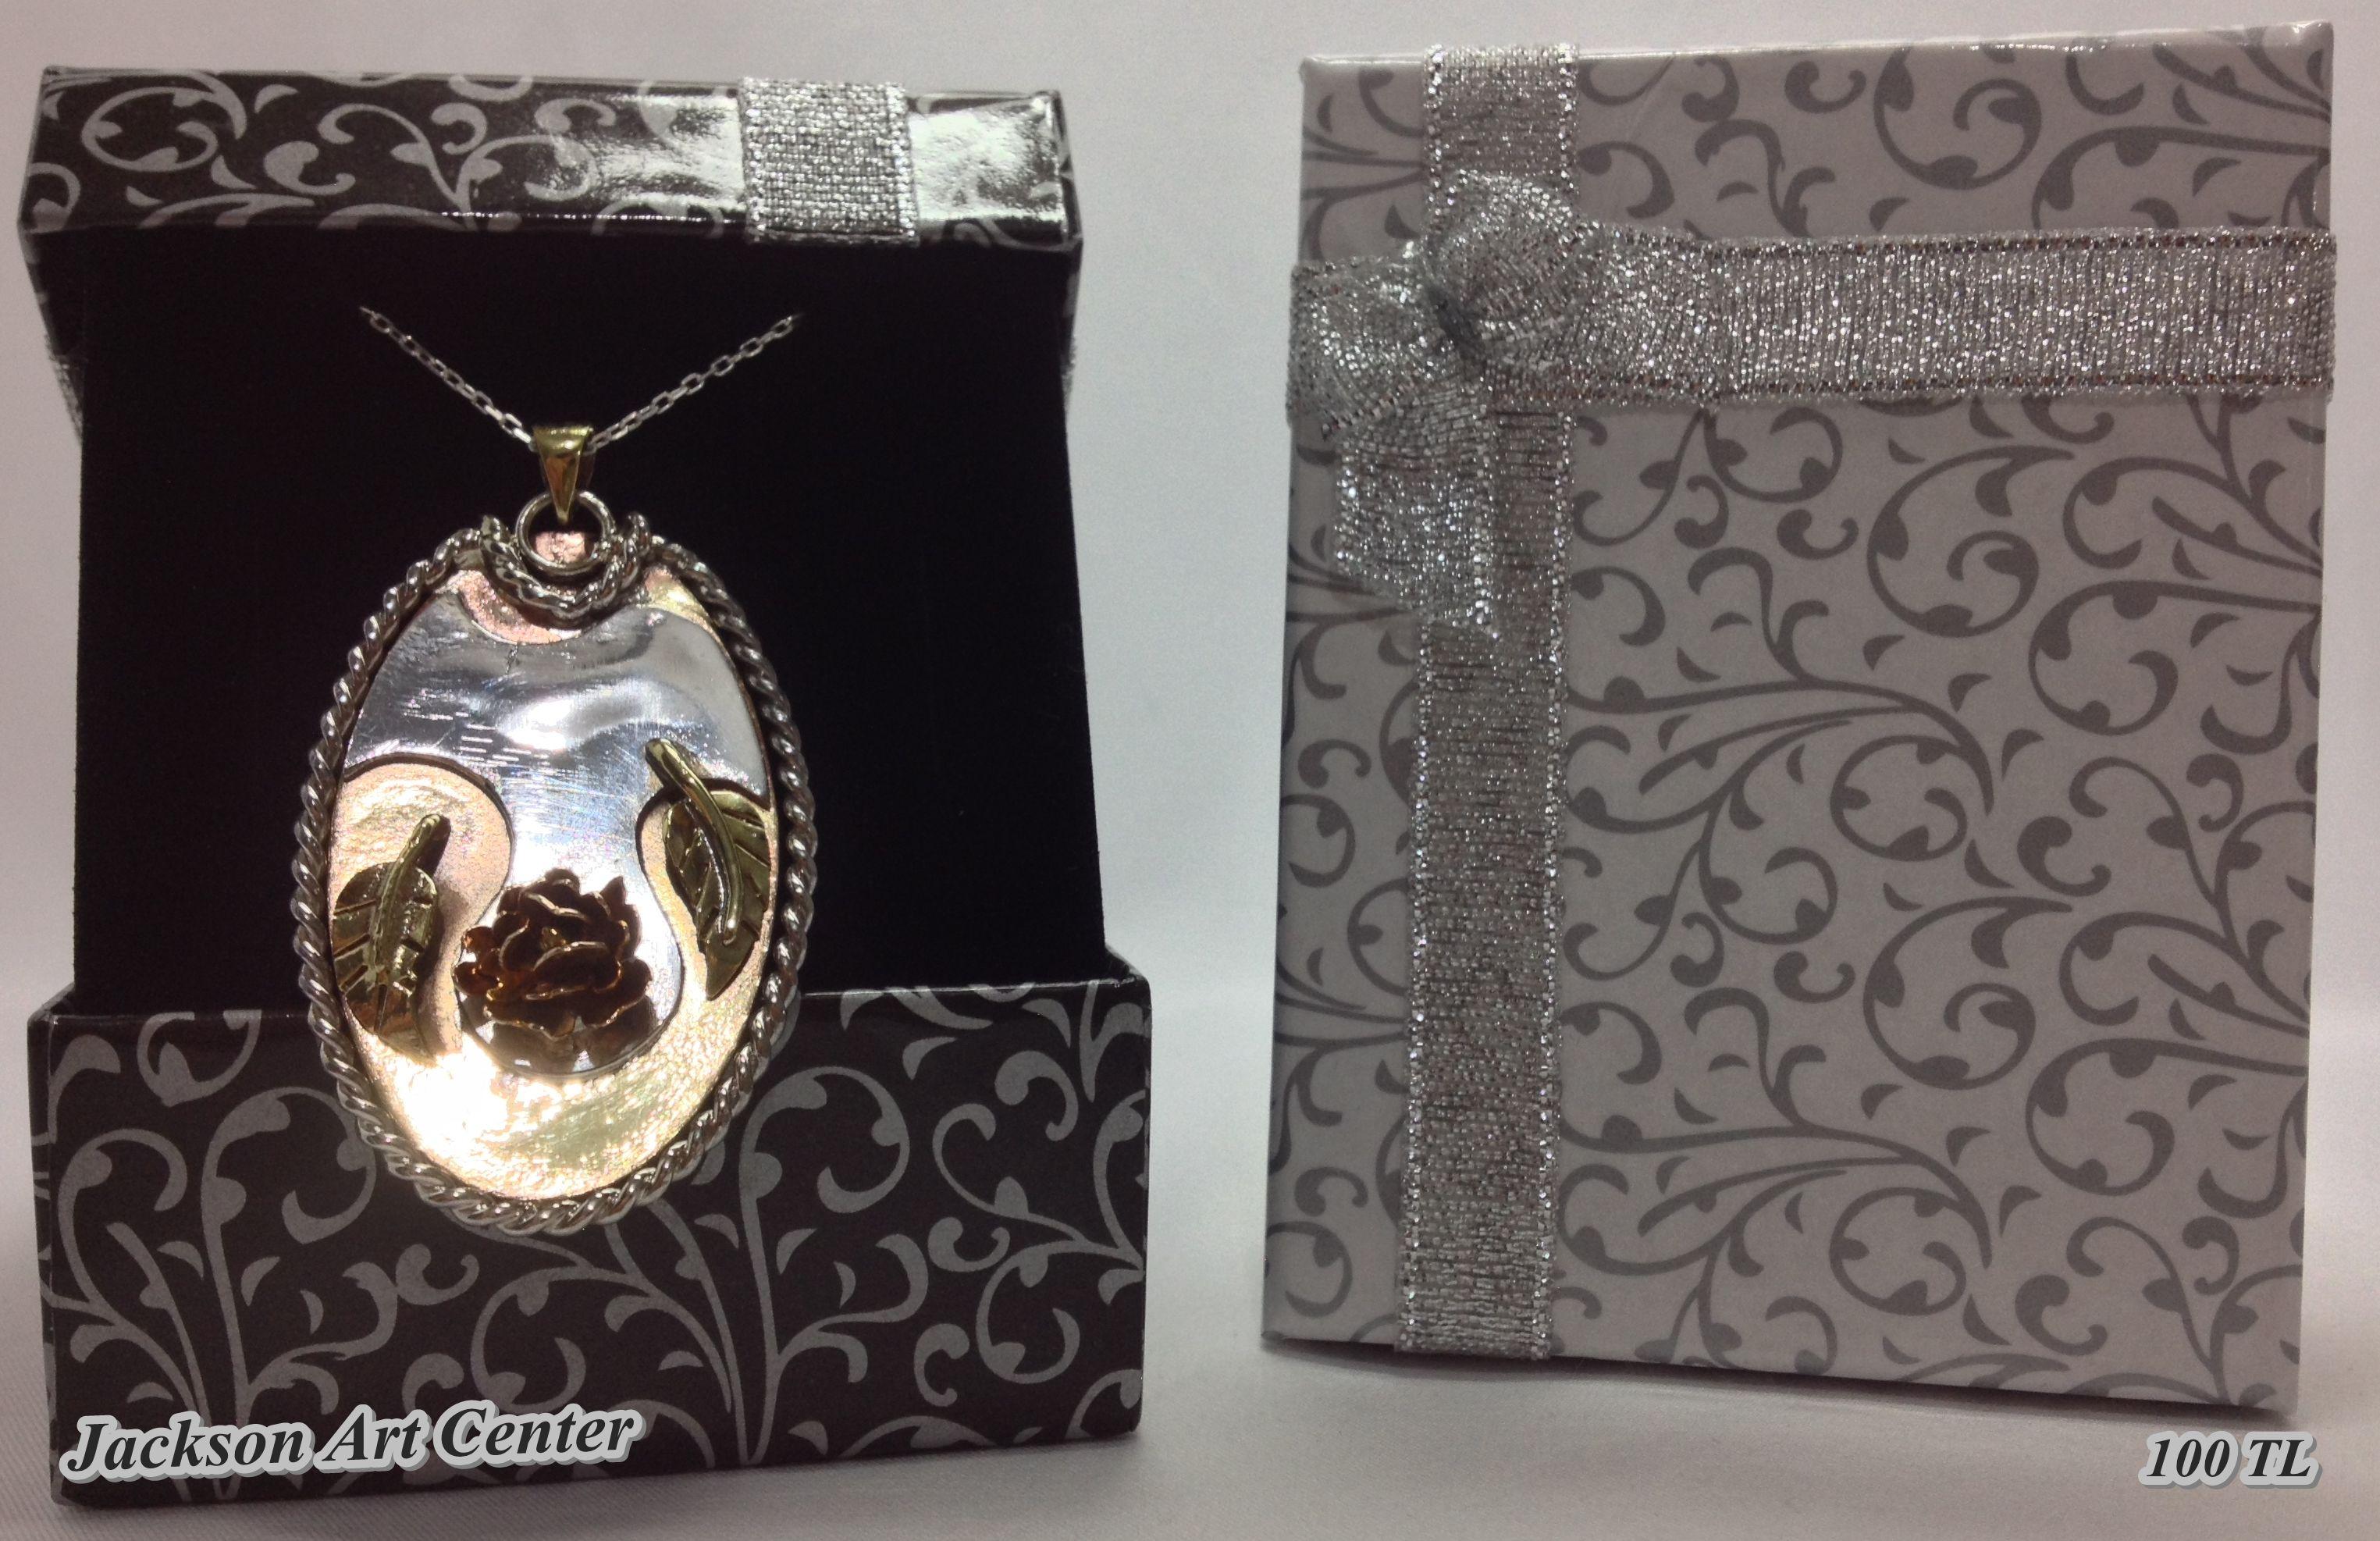 hangi renk kutuyu isterseniz o kutuyla ürün kapınızda #handmade #jewelry